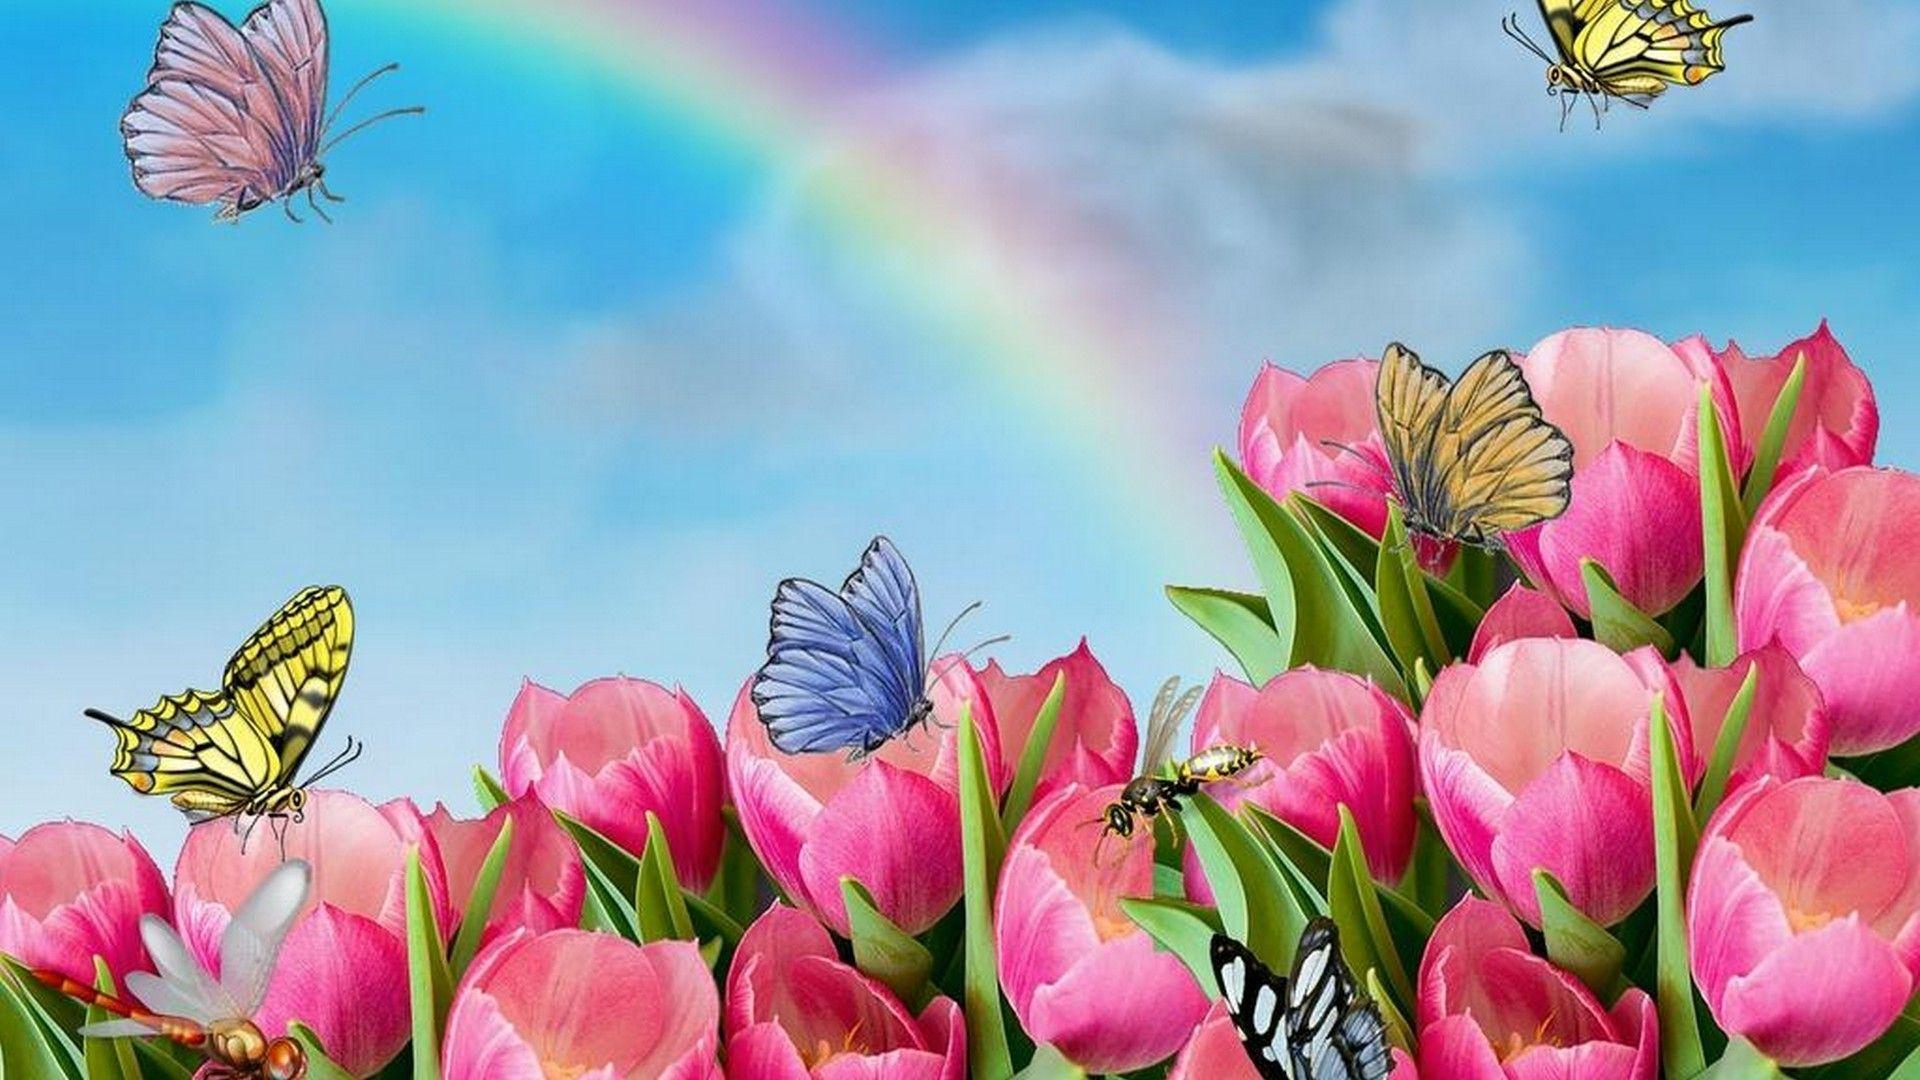 Animated Flower Wallpaper Best HD Wallpapers Flower